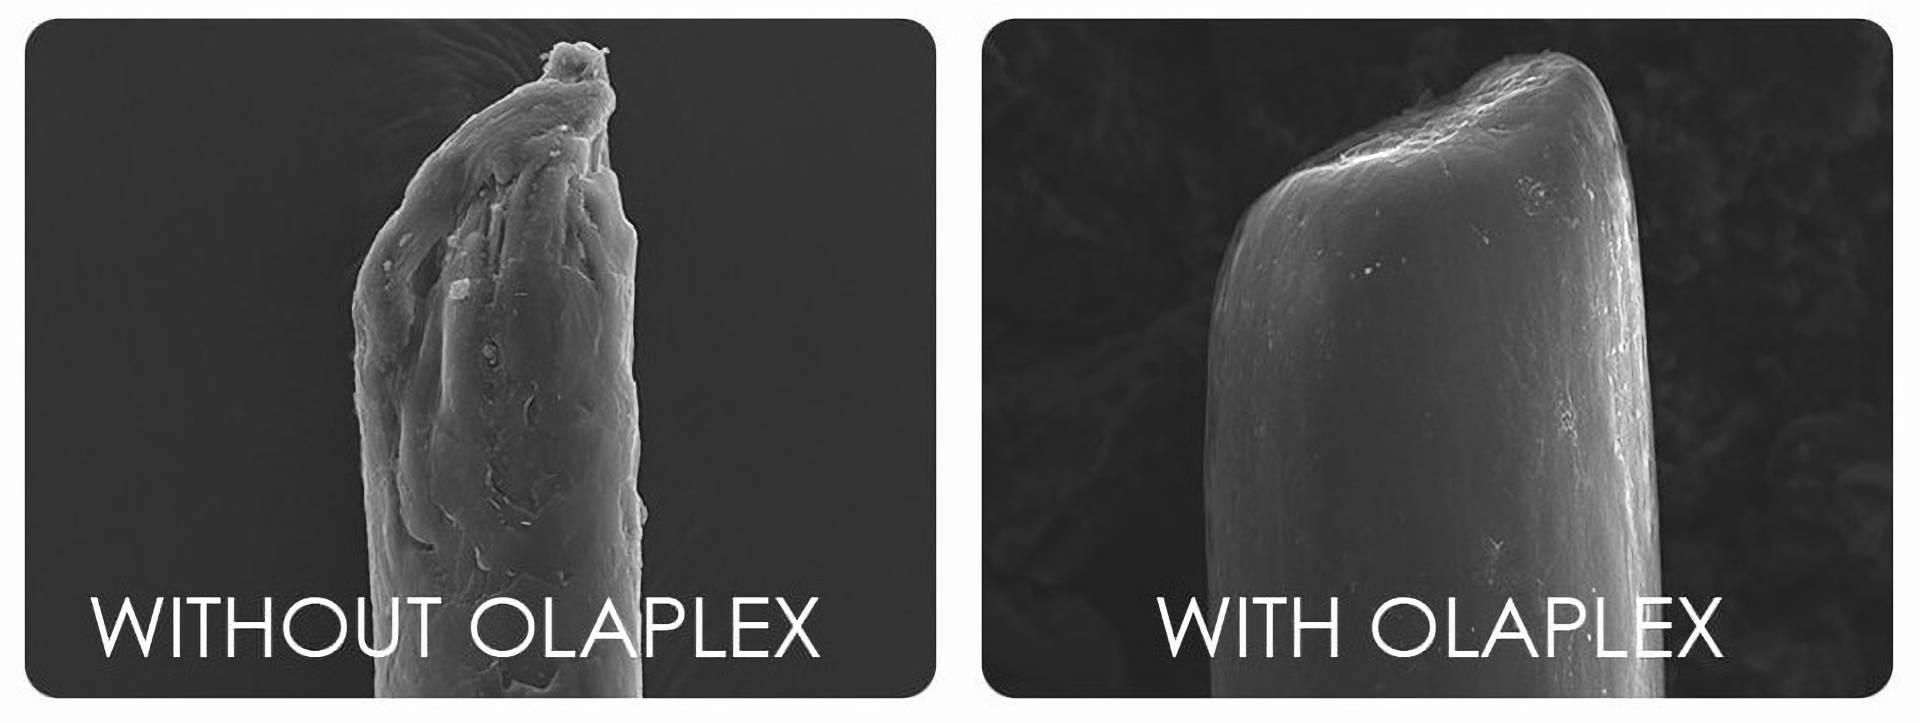 Mini Olaplex Before and after - Olaplex-Treatment